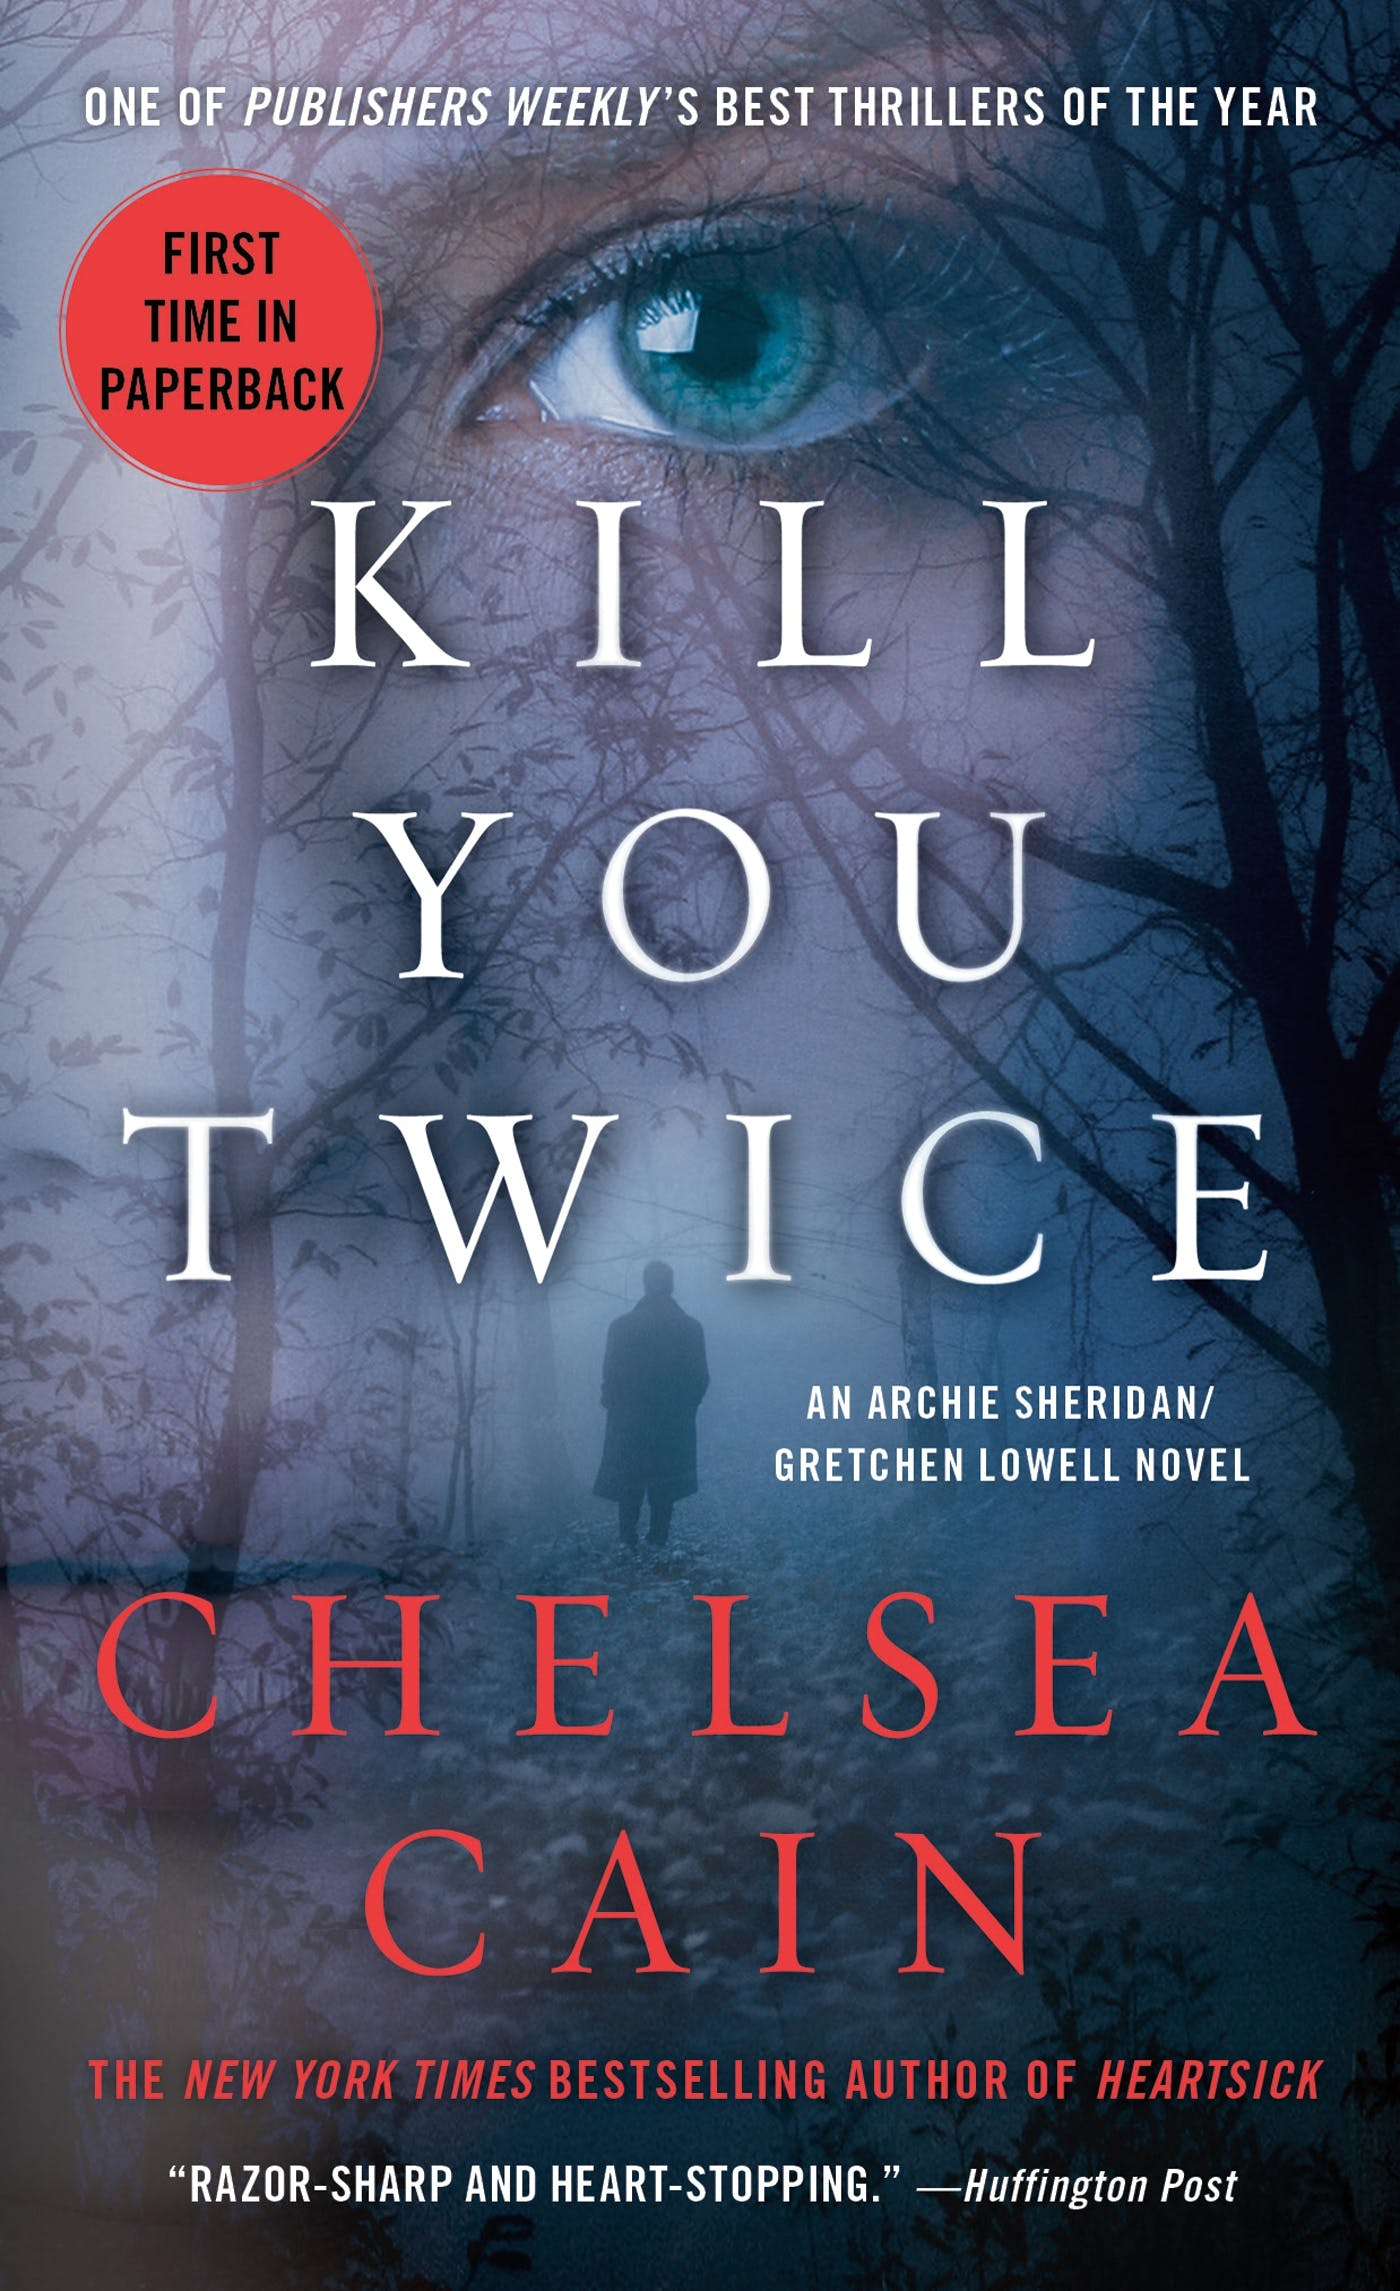 Image of Kill You Twice